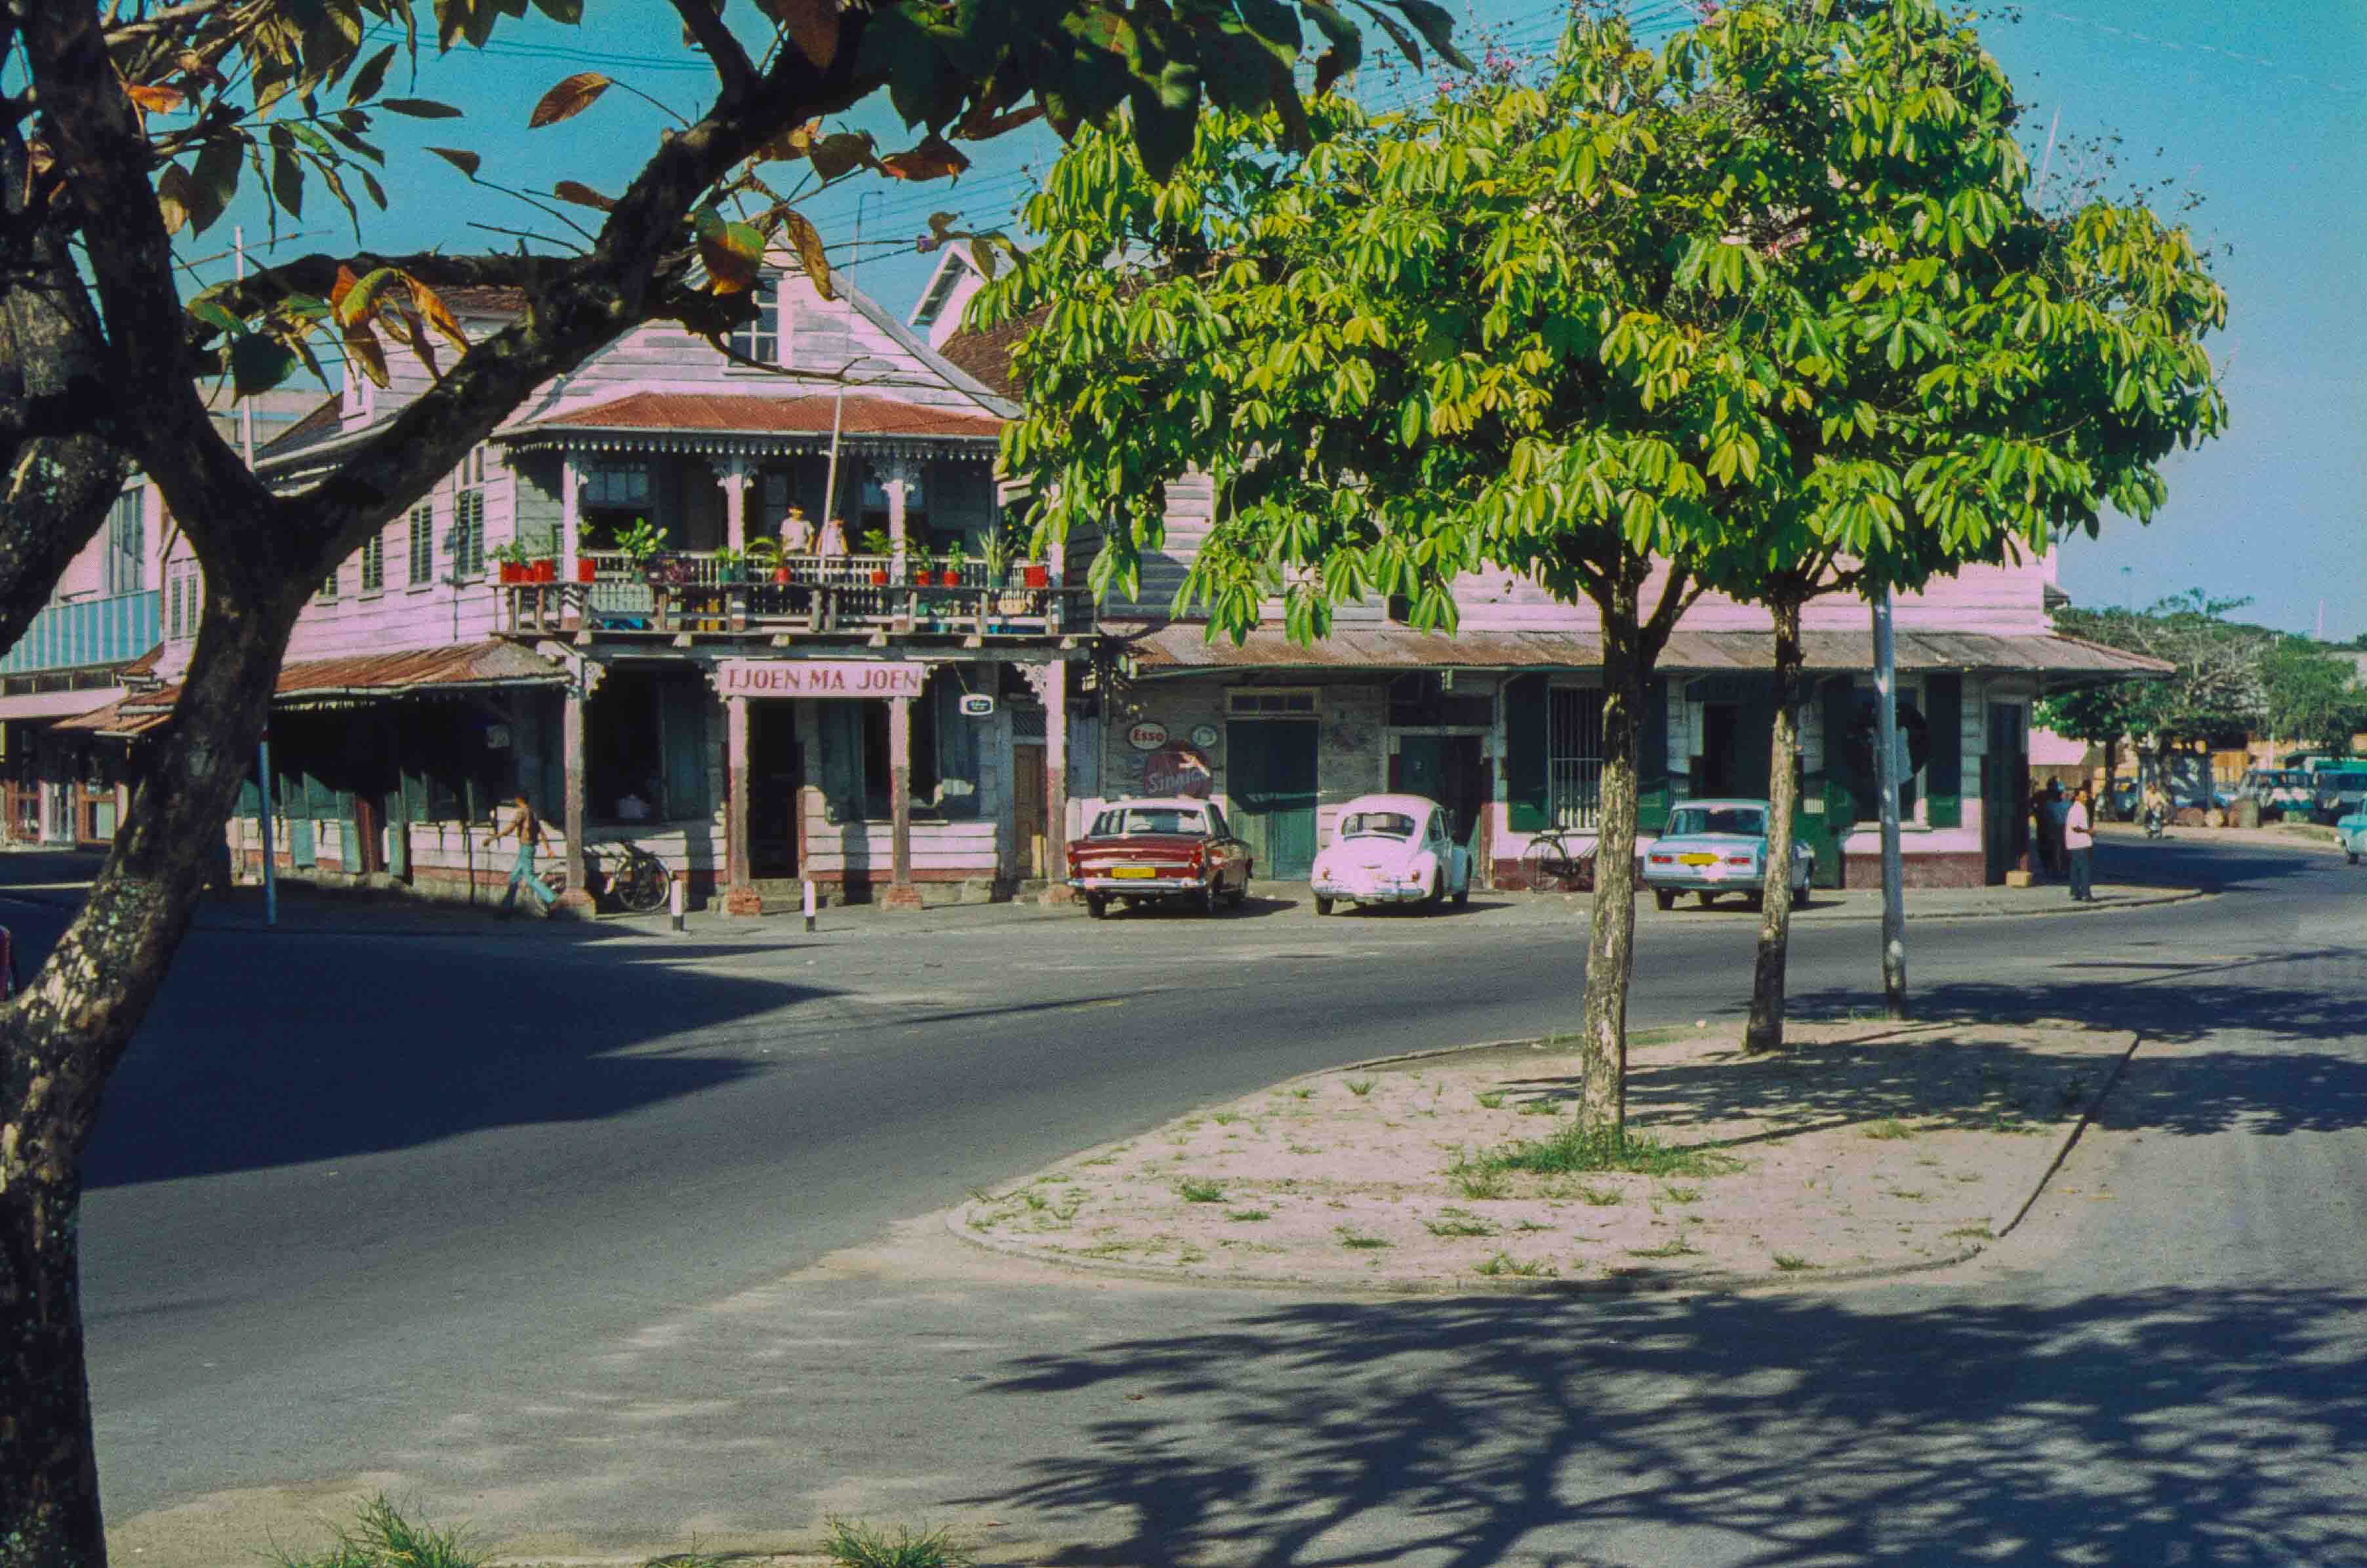 164. Suriname